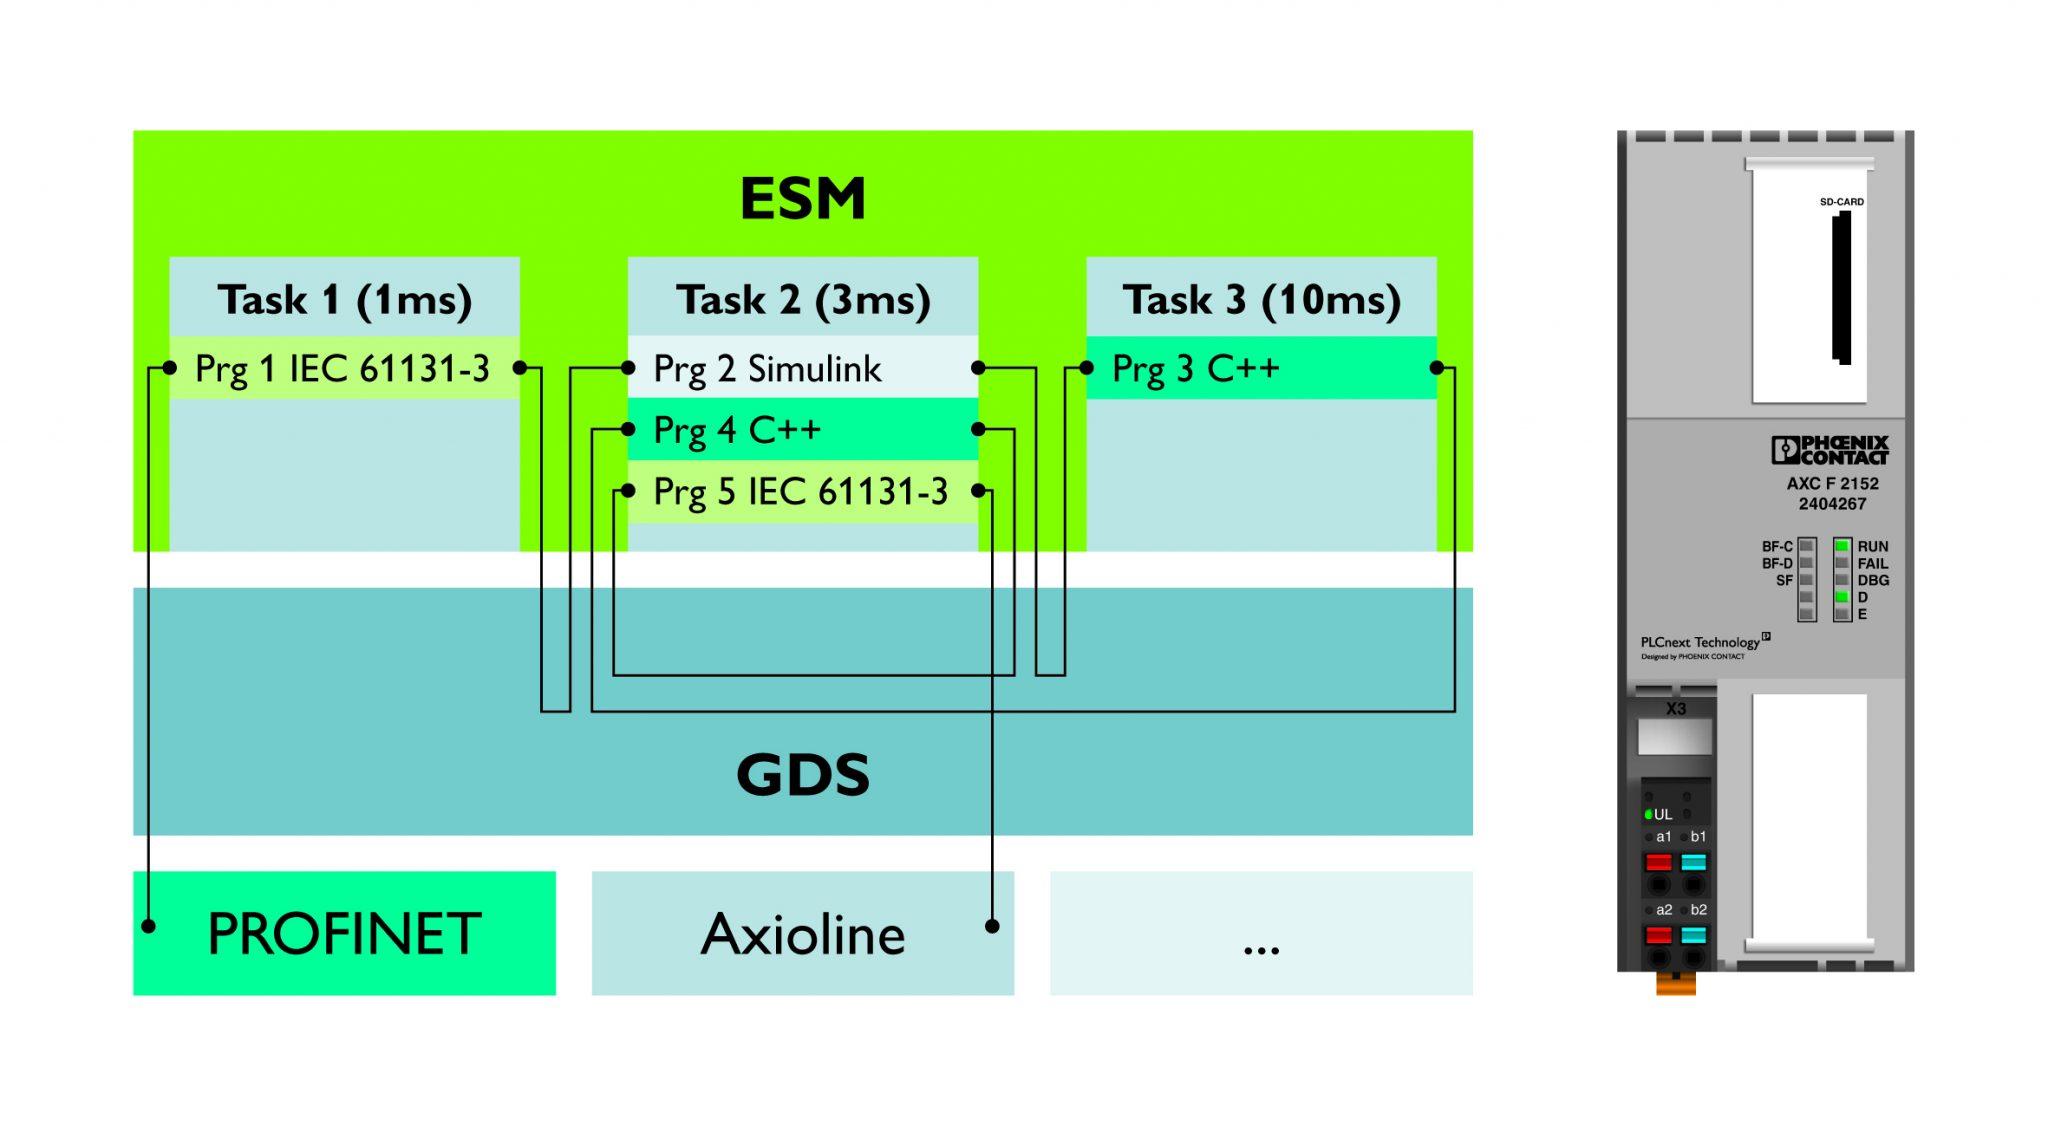 Platforma technologiczna zawiera Global Data Space (GDS) i Execution and Synchronization Manager (ESM)